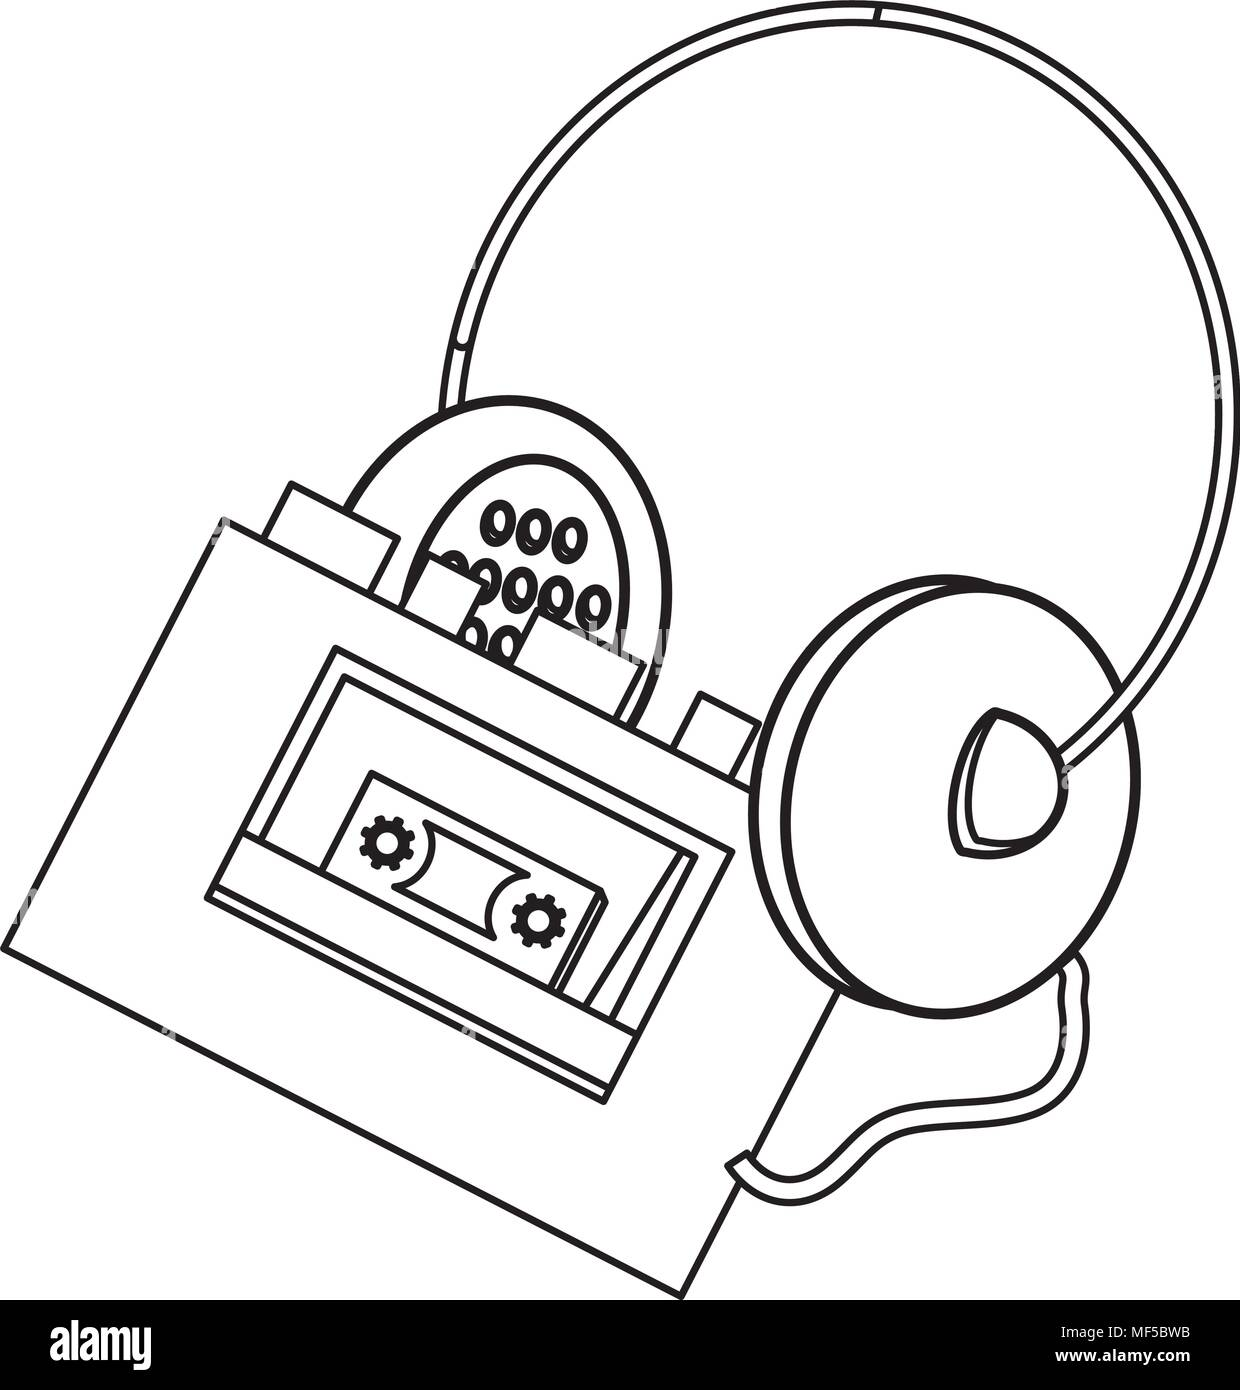 Cassette Tape Headphones Stock Photos & Cassette Tape Headphones